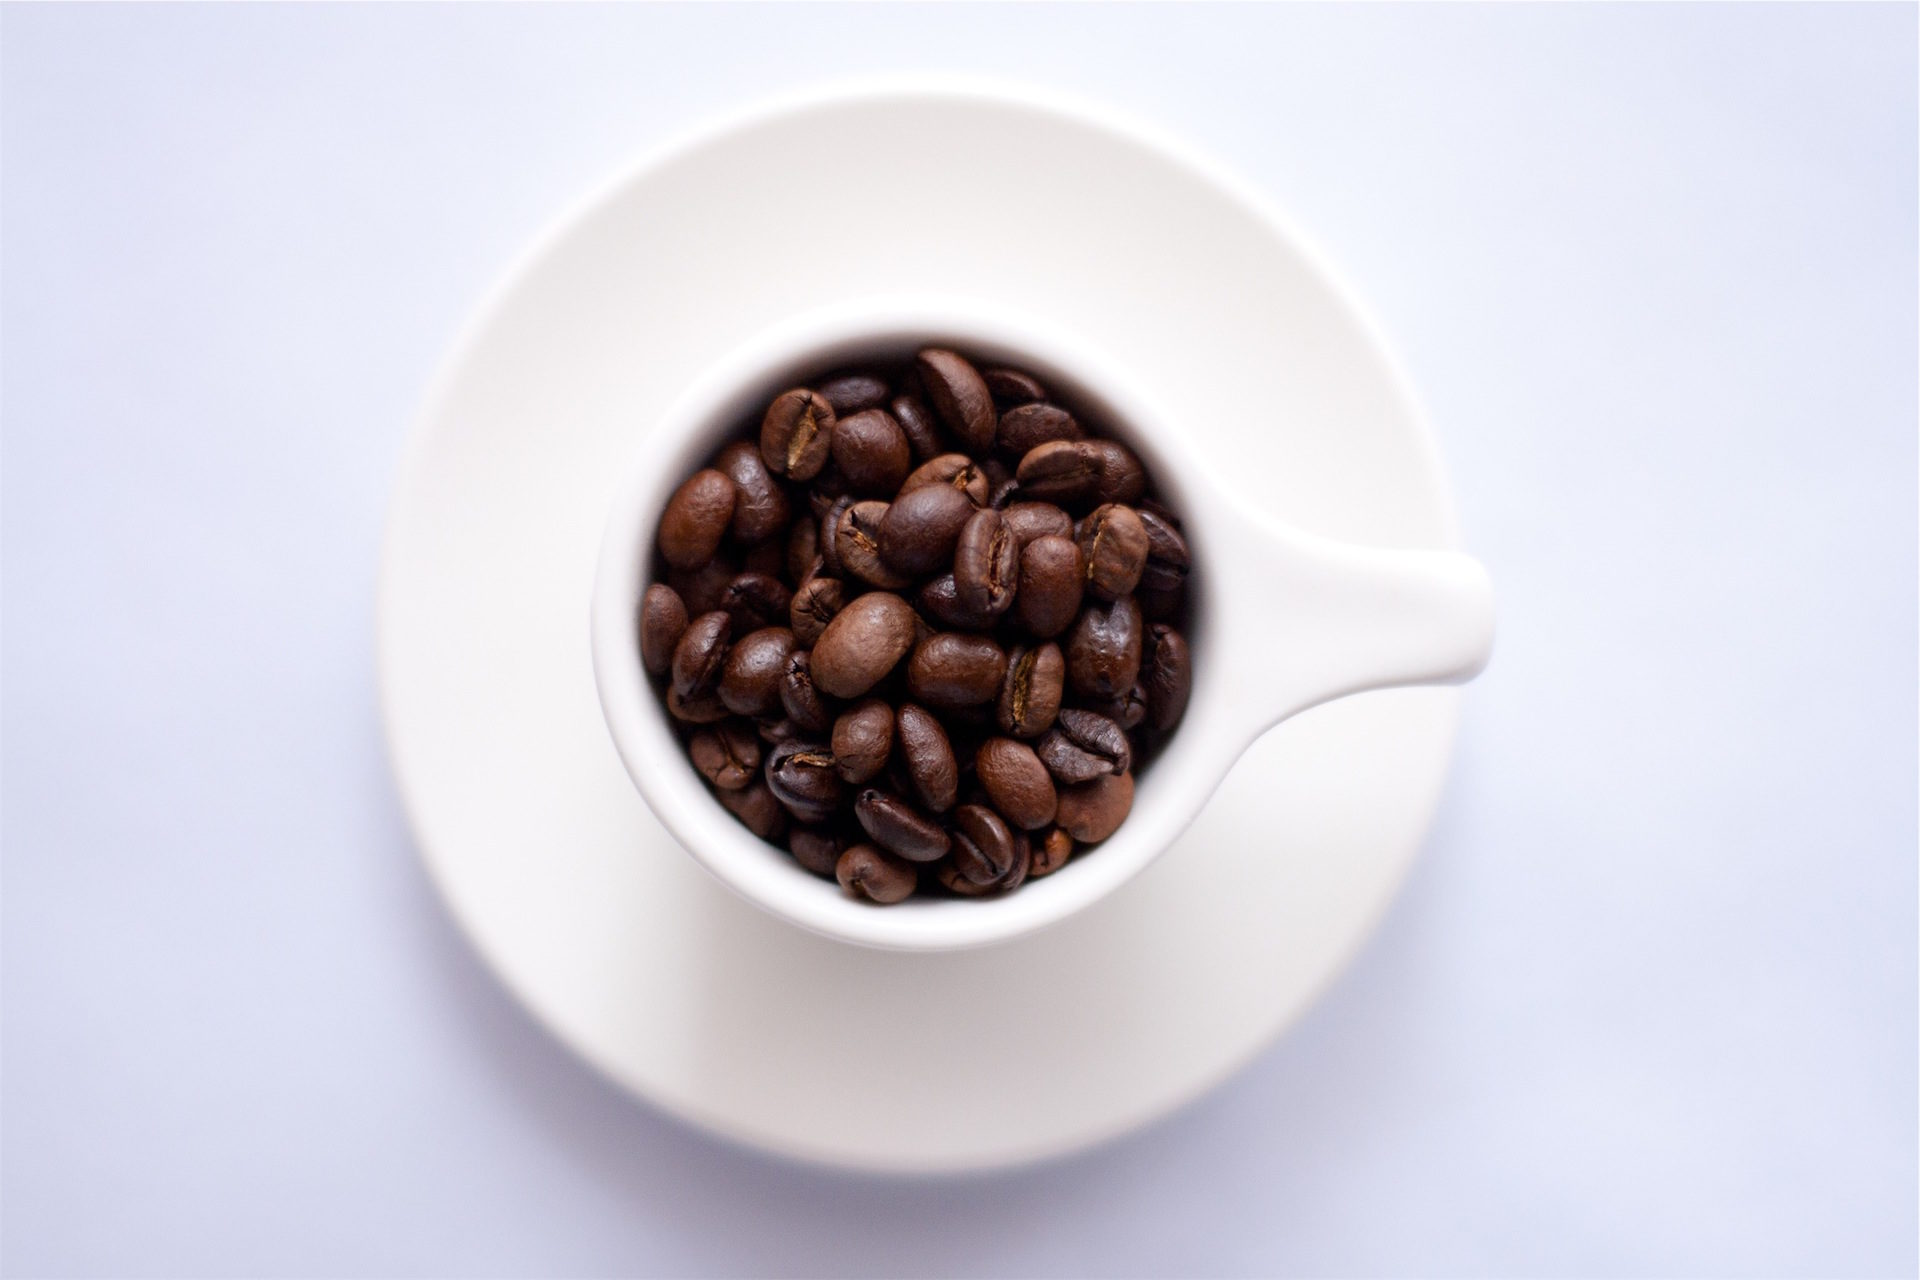 कप, कॉफी, अनाज, पकवान, सफेद - HD वॉलपेपर - प्रोफेसर-falken.com